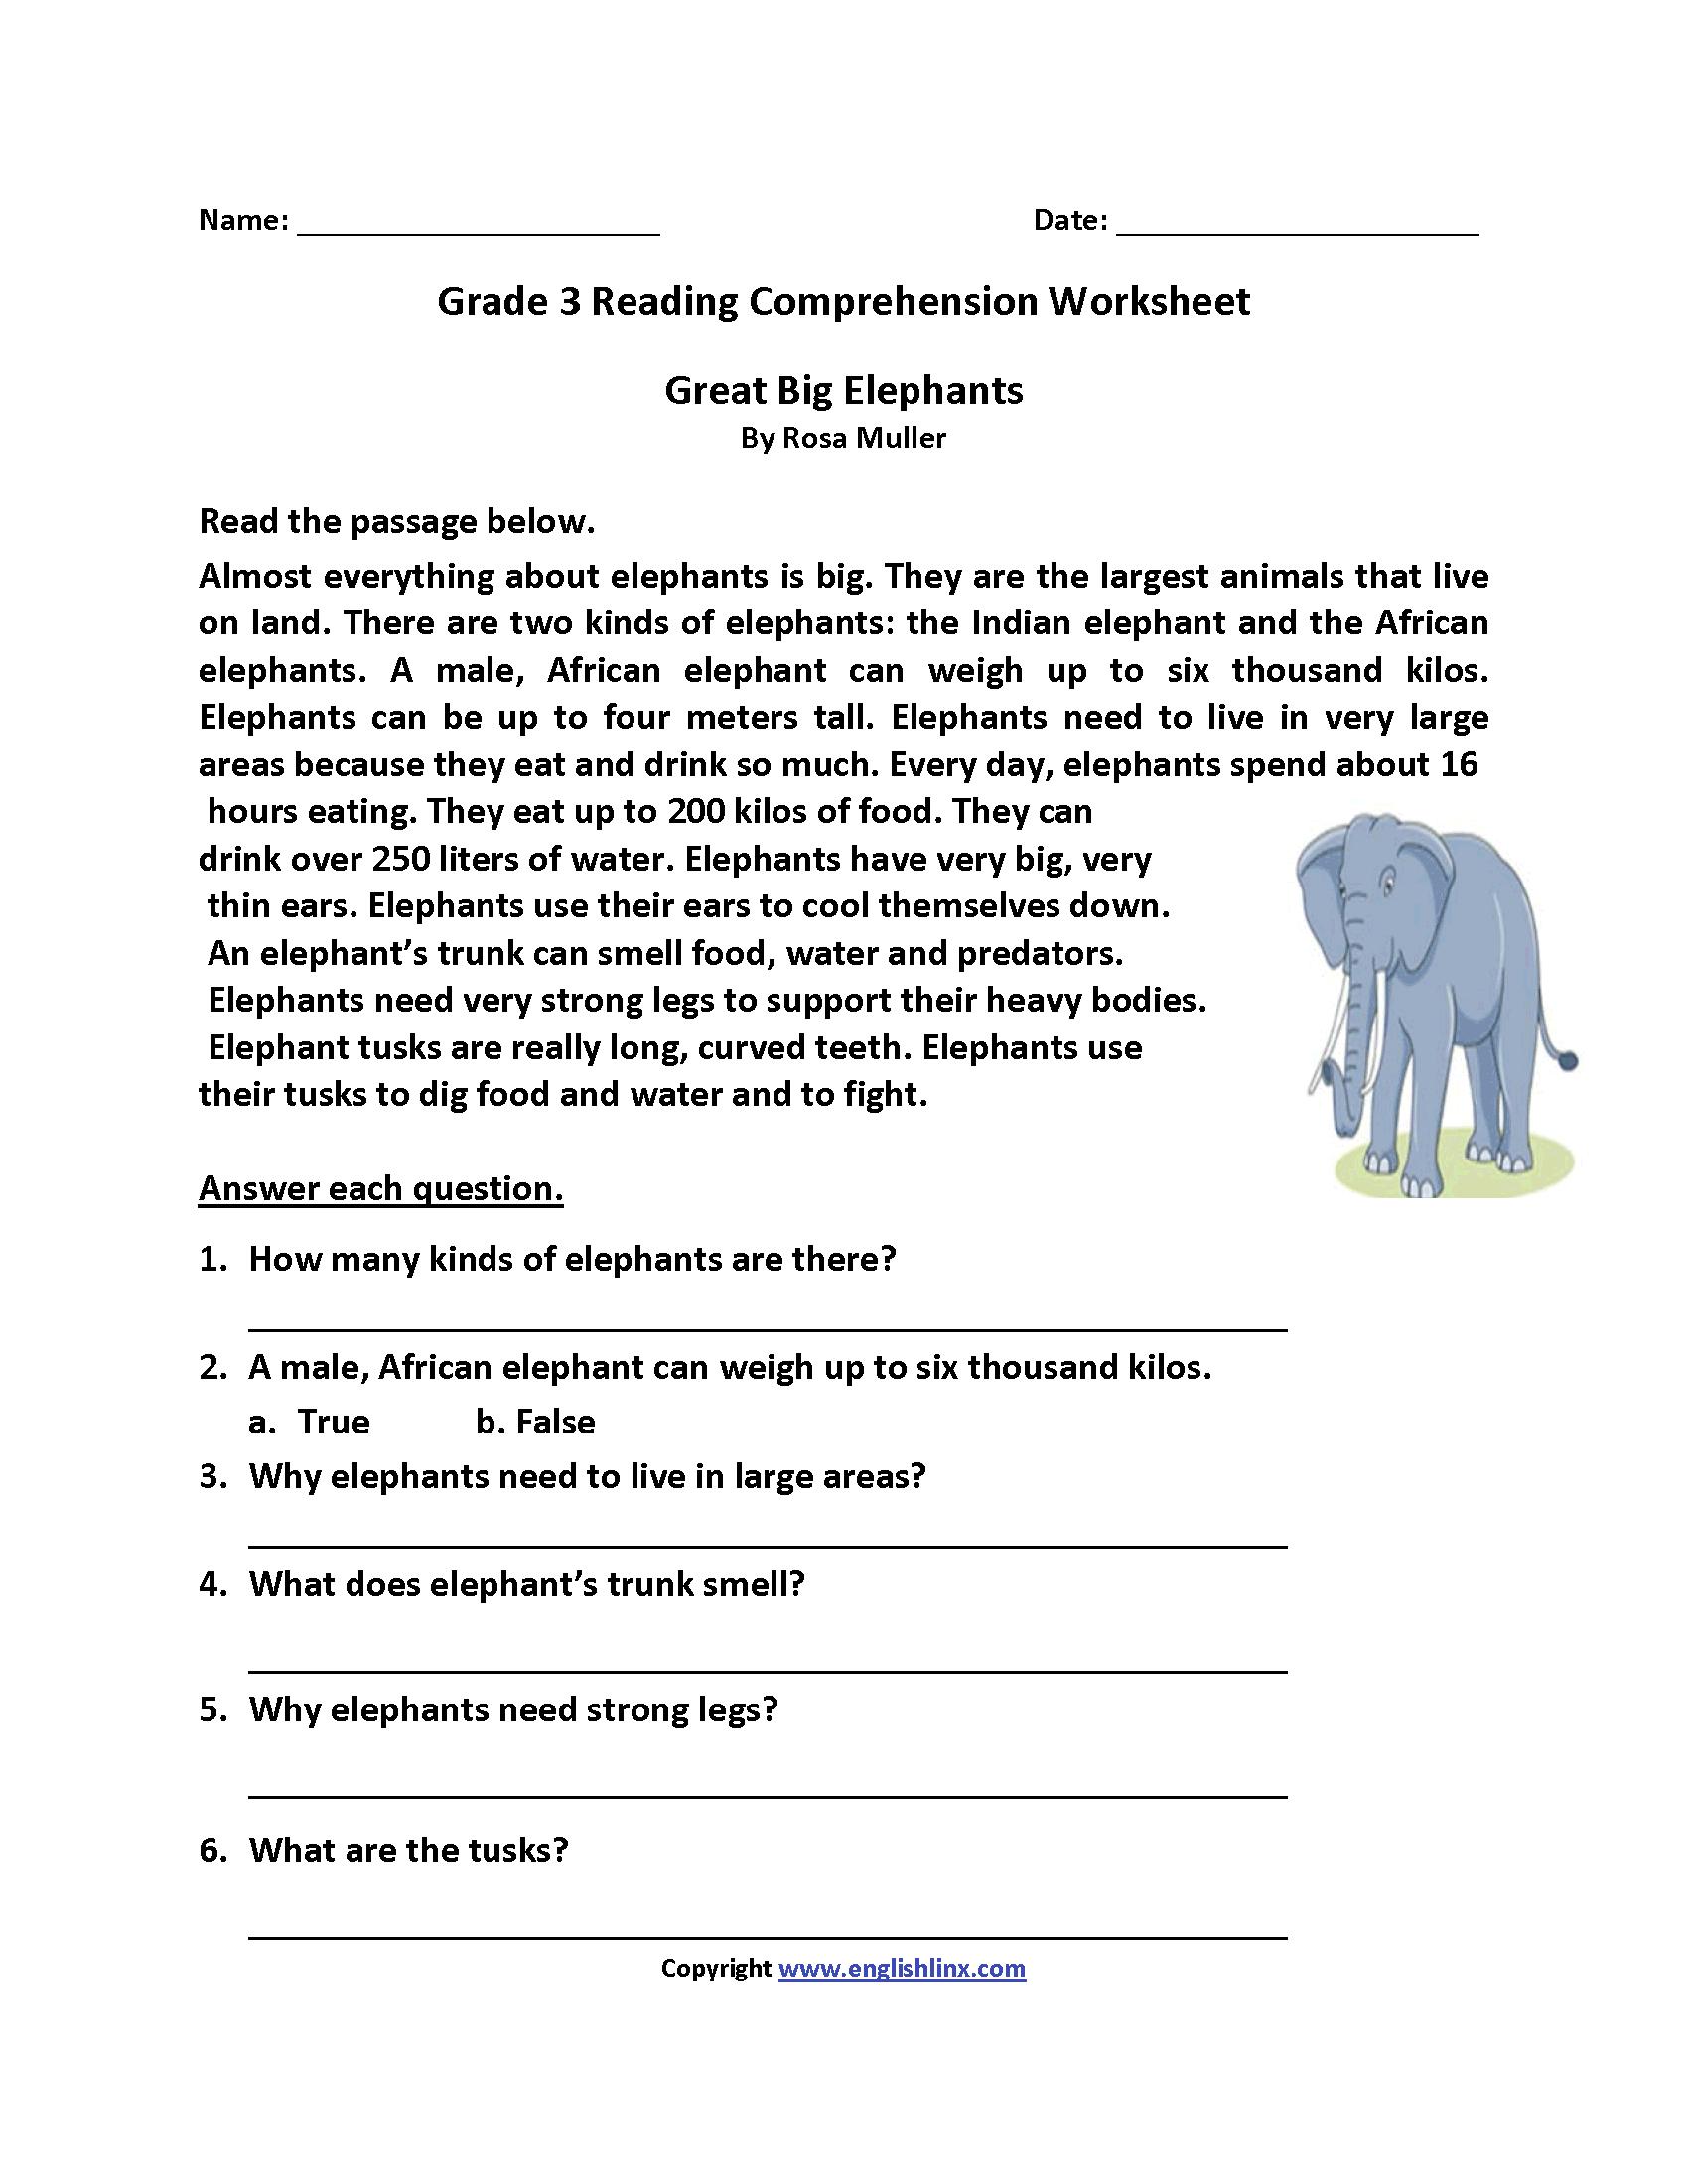 Great Big Elephants Third Grade Reading Worksheets | Board | Reading - Third Grade Reading Worksheets Free Printable